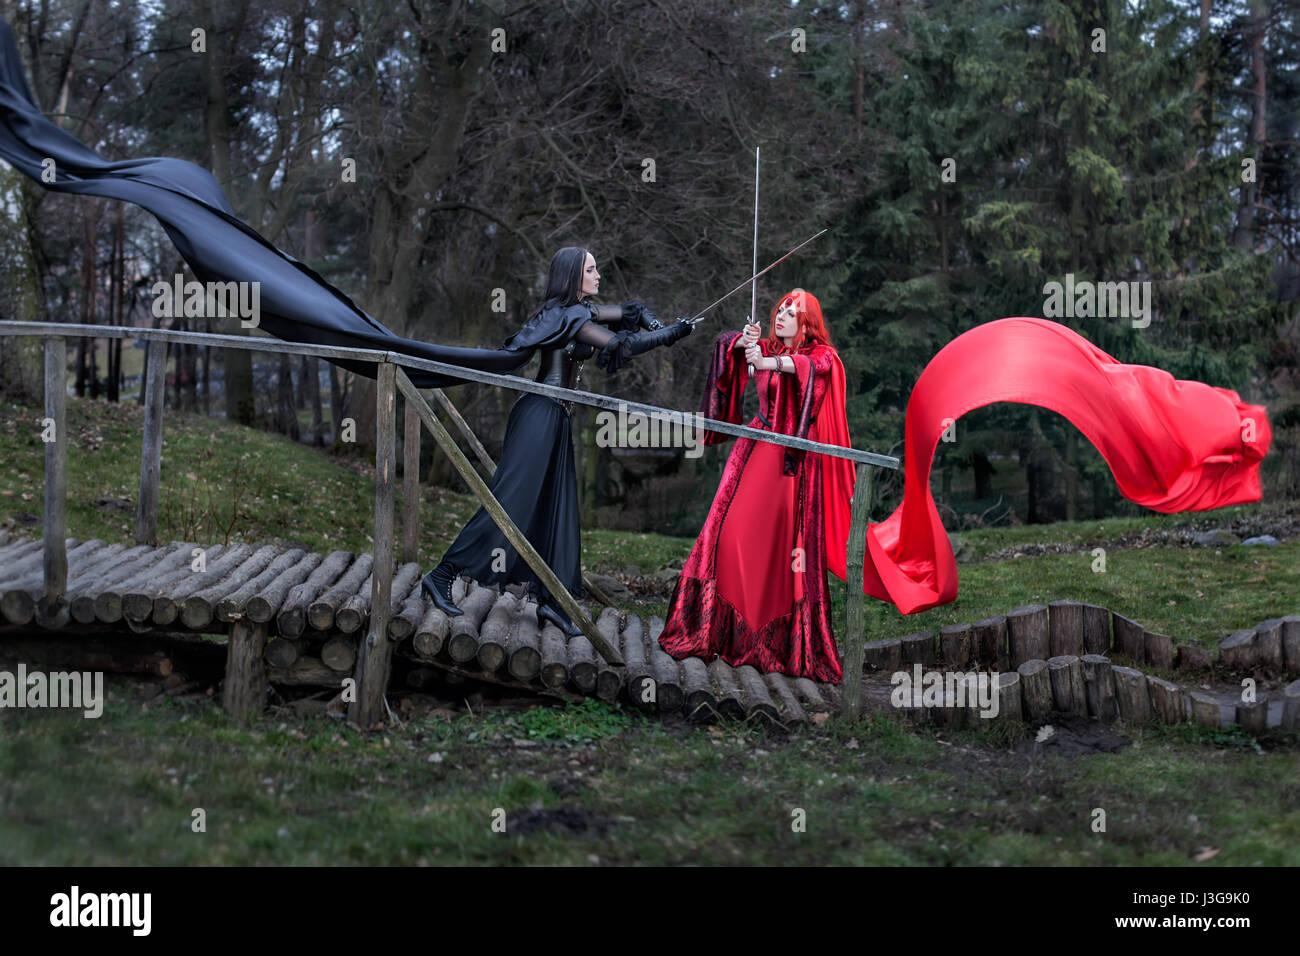 Girl in a red vintage dress beats swords Girl in black dress old. - Stock Image